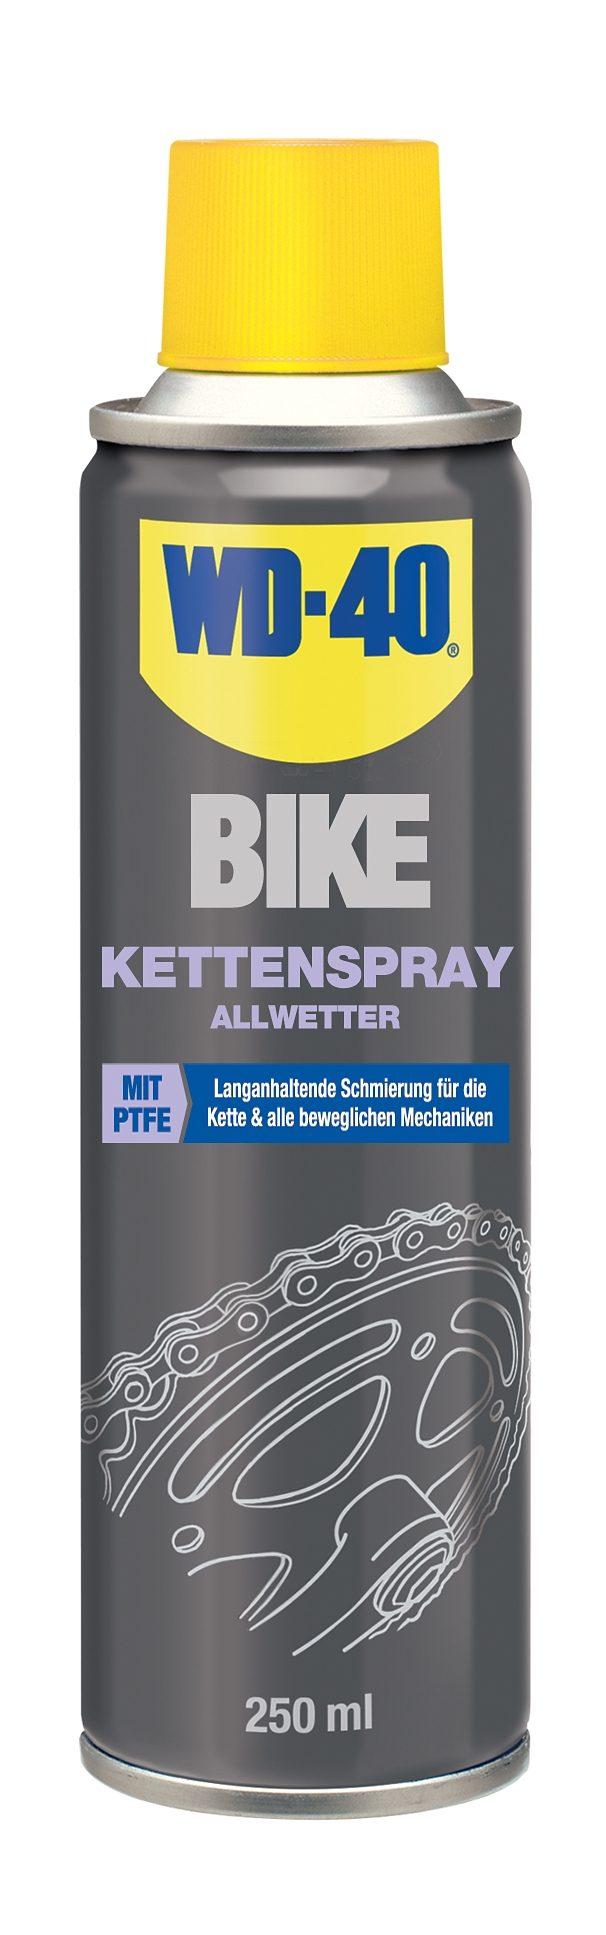 WD-40 Fahrrad Reiniger »Kettenspray Allwetter 250 ml«